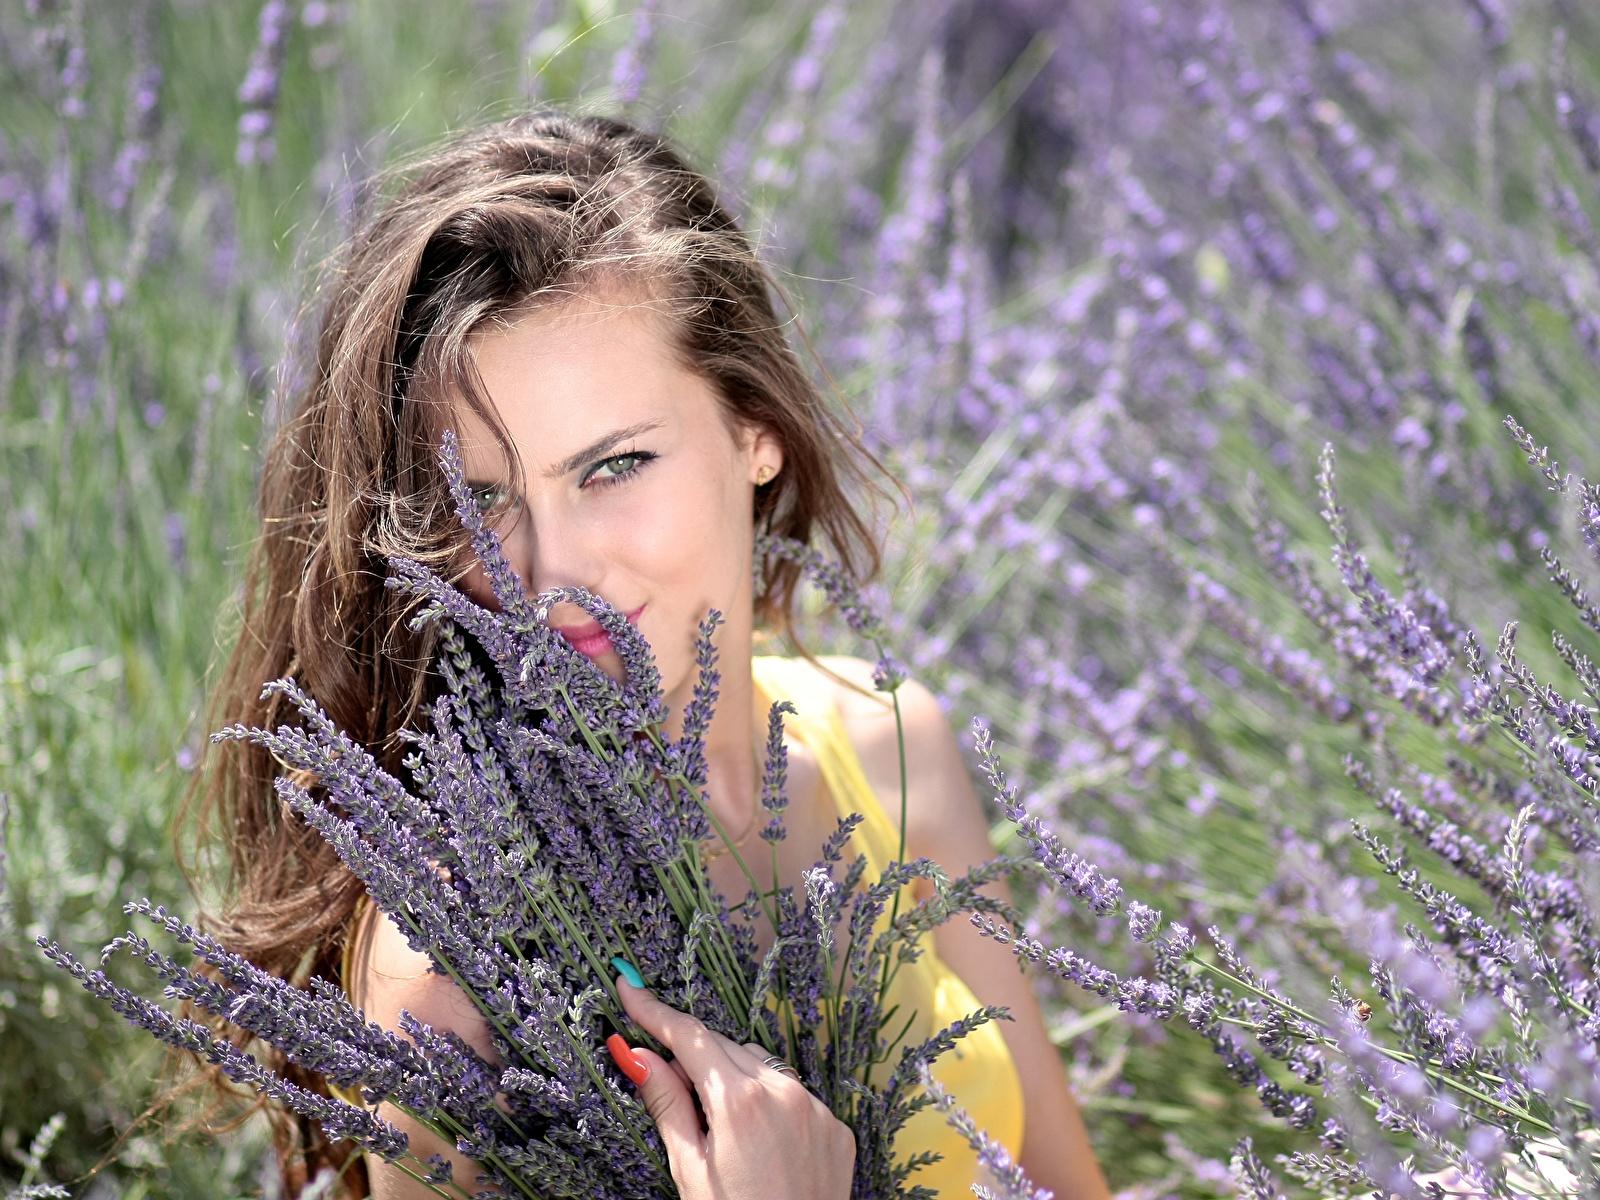 Фото Шатенка Маникюр Улыбка Красивые Девушки Лаванда Взгляд 1600x1200 смотрит